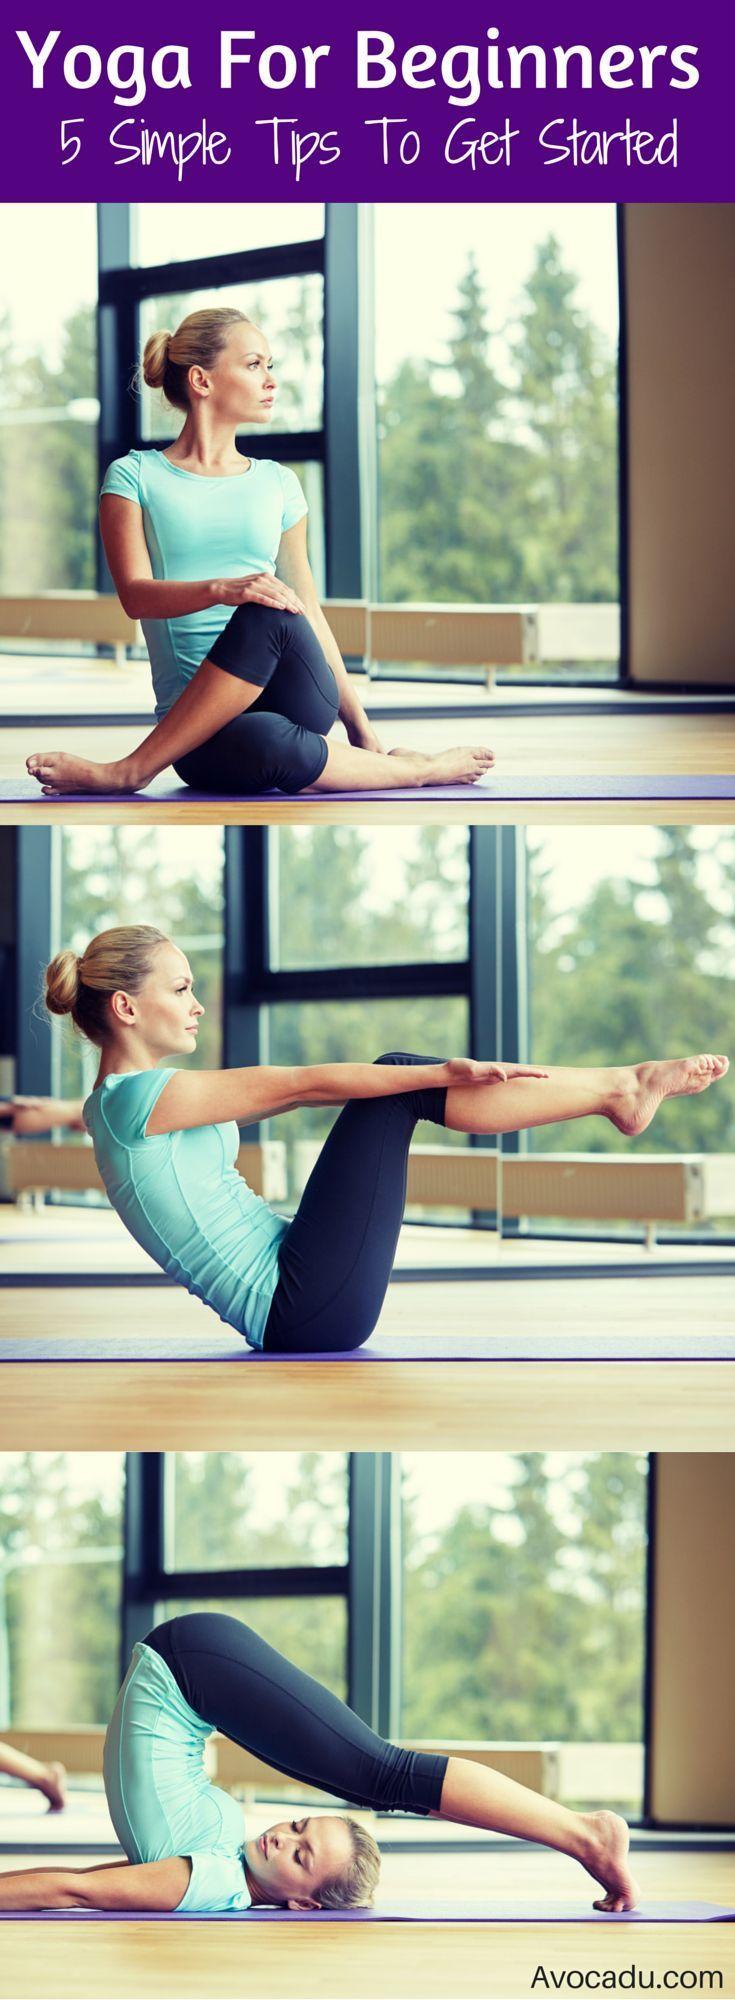 Yoga for Beginners | Yoga Tips for Beginners | Yoga Workout Tips | #yogaforbegin...